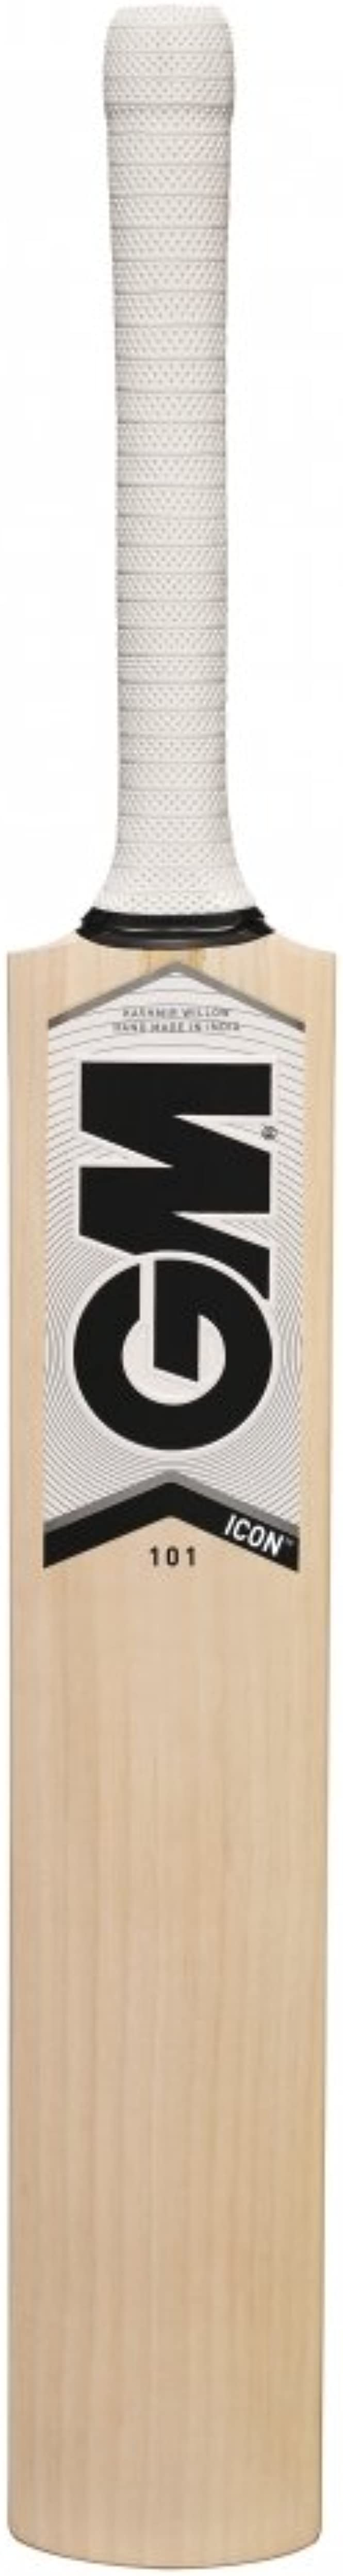 Gunn and Moore Icon 101 Cricket Bat Size harrow